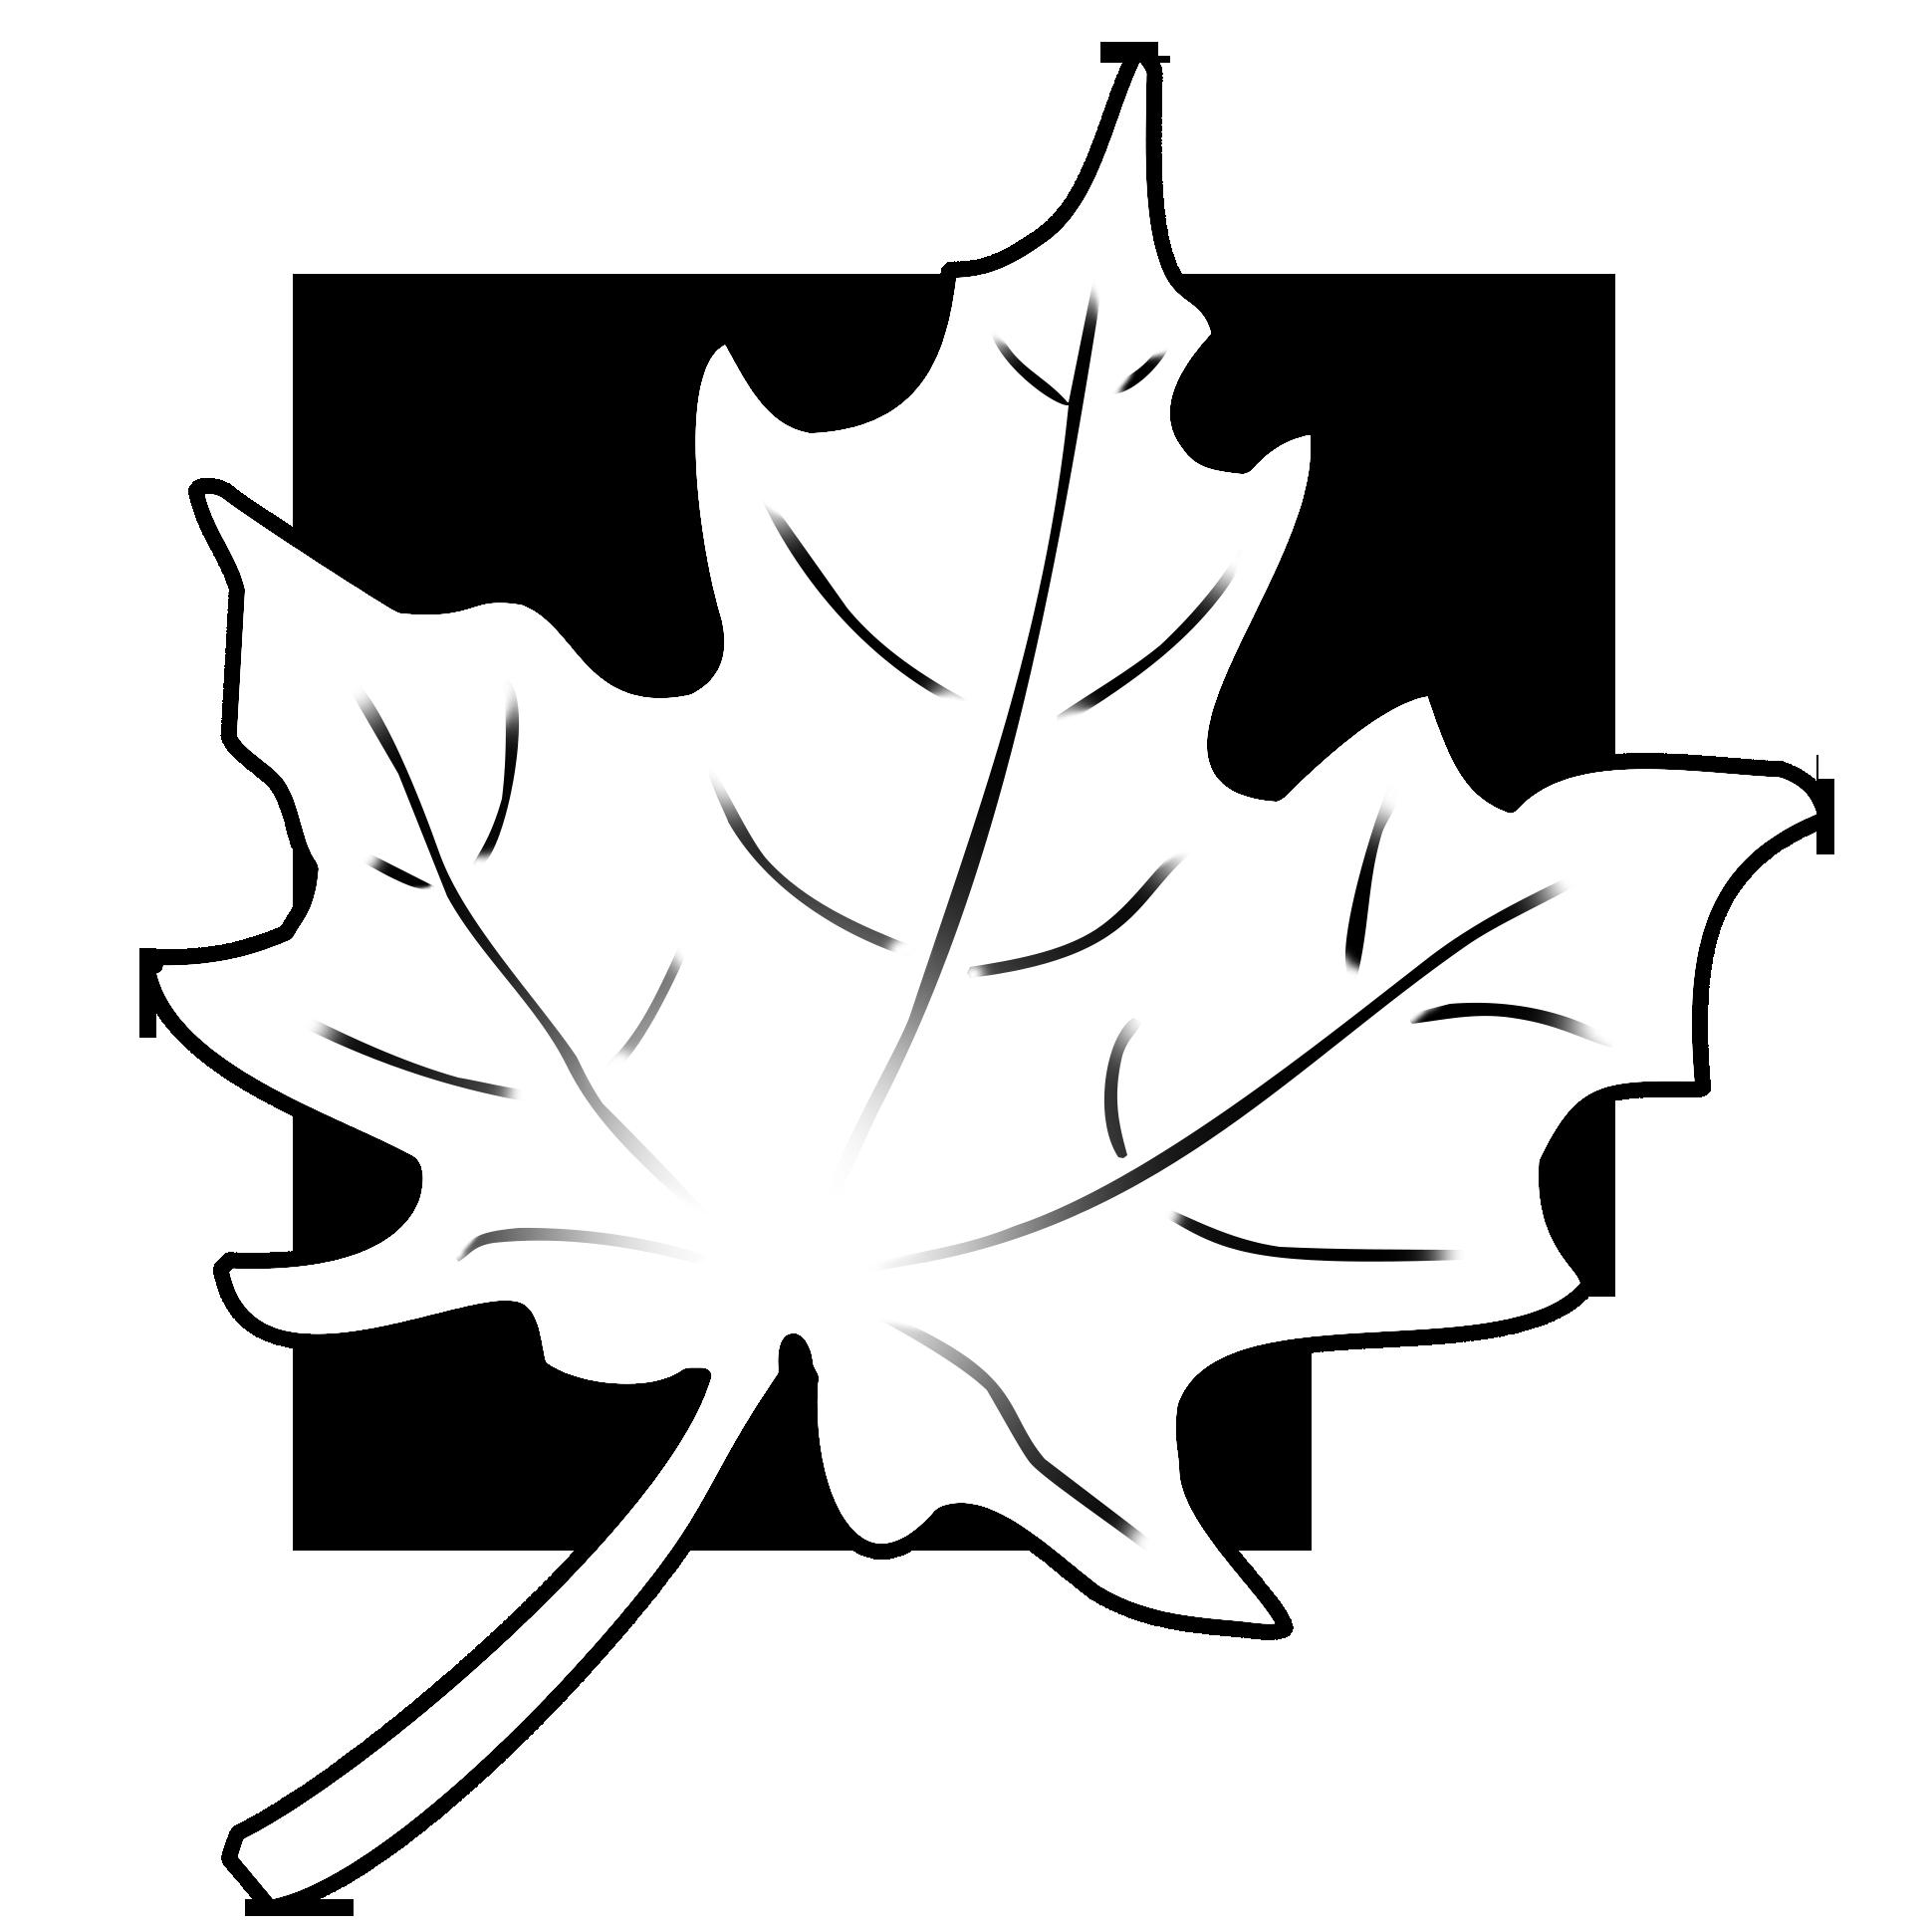 Herbstblätter Vorlagen Herbstblätter vorlagen